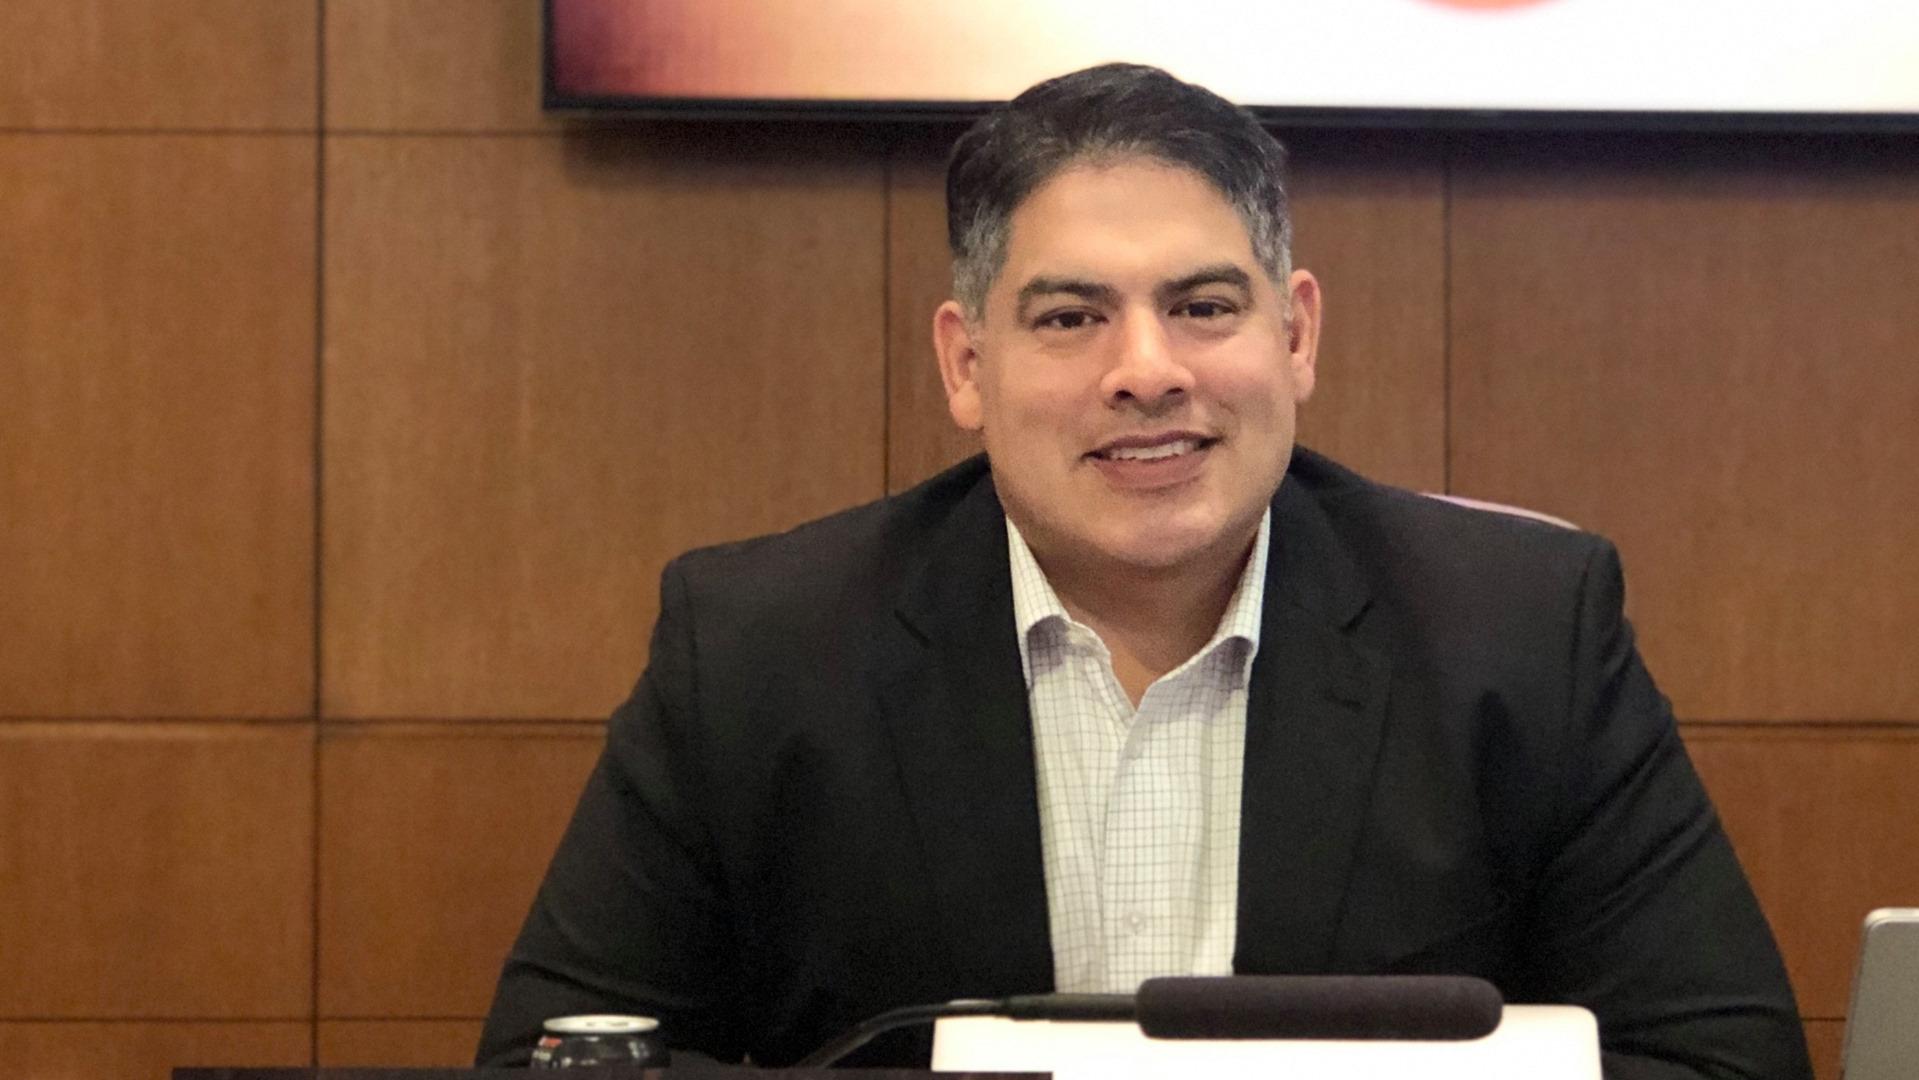 Councilman Manny Pelaez